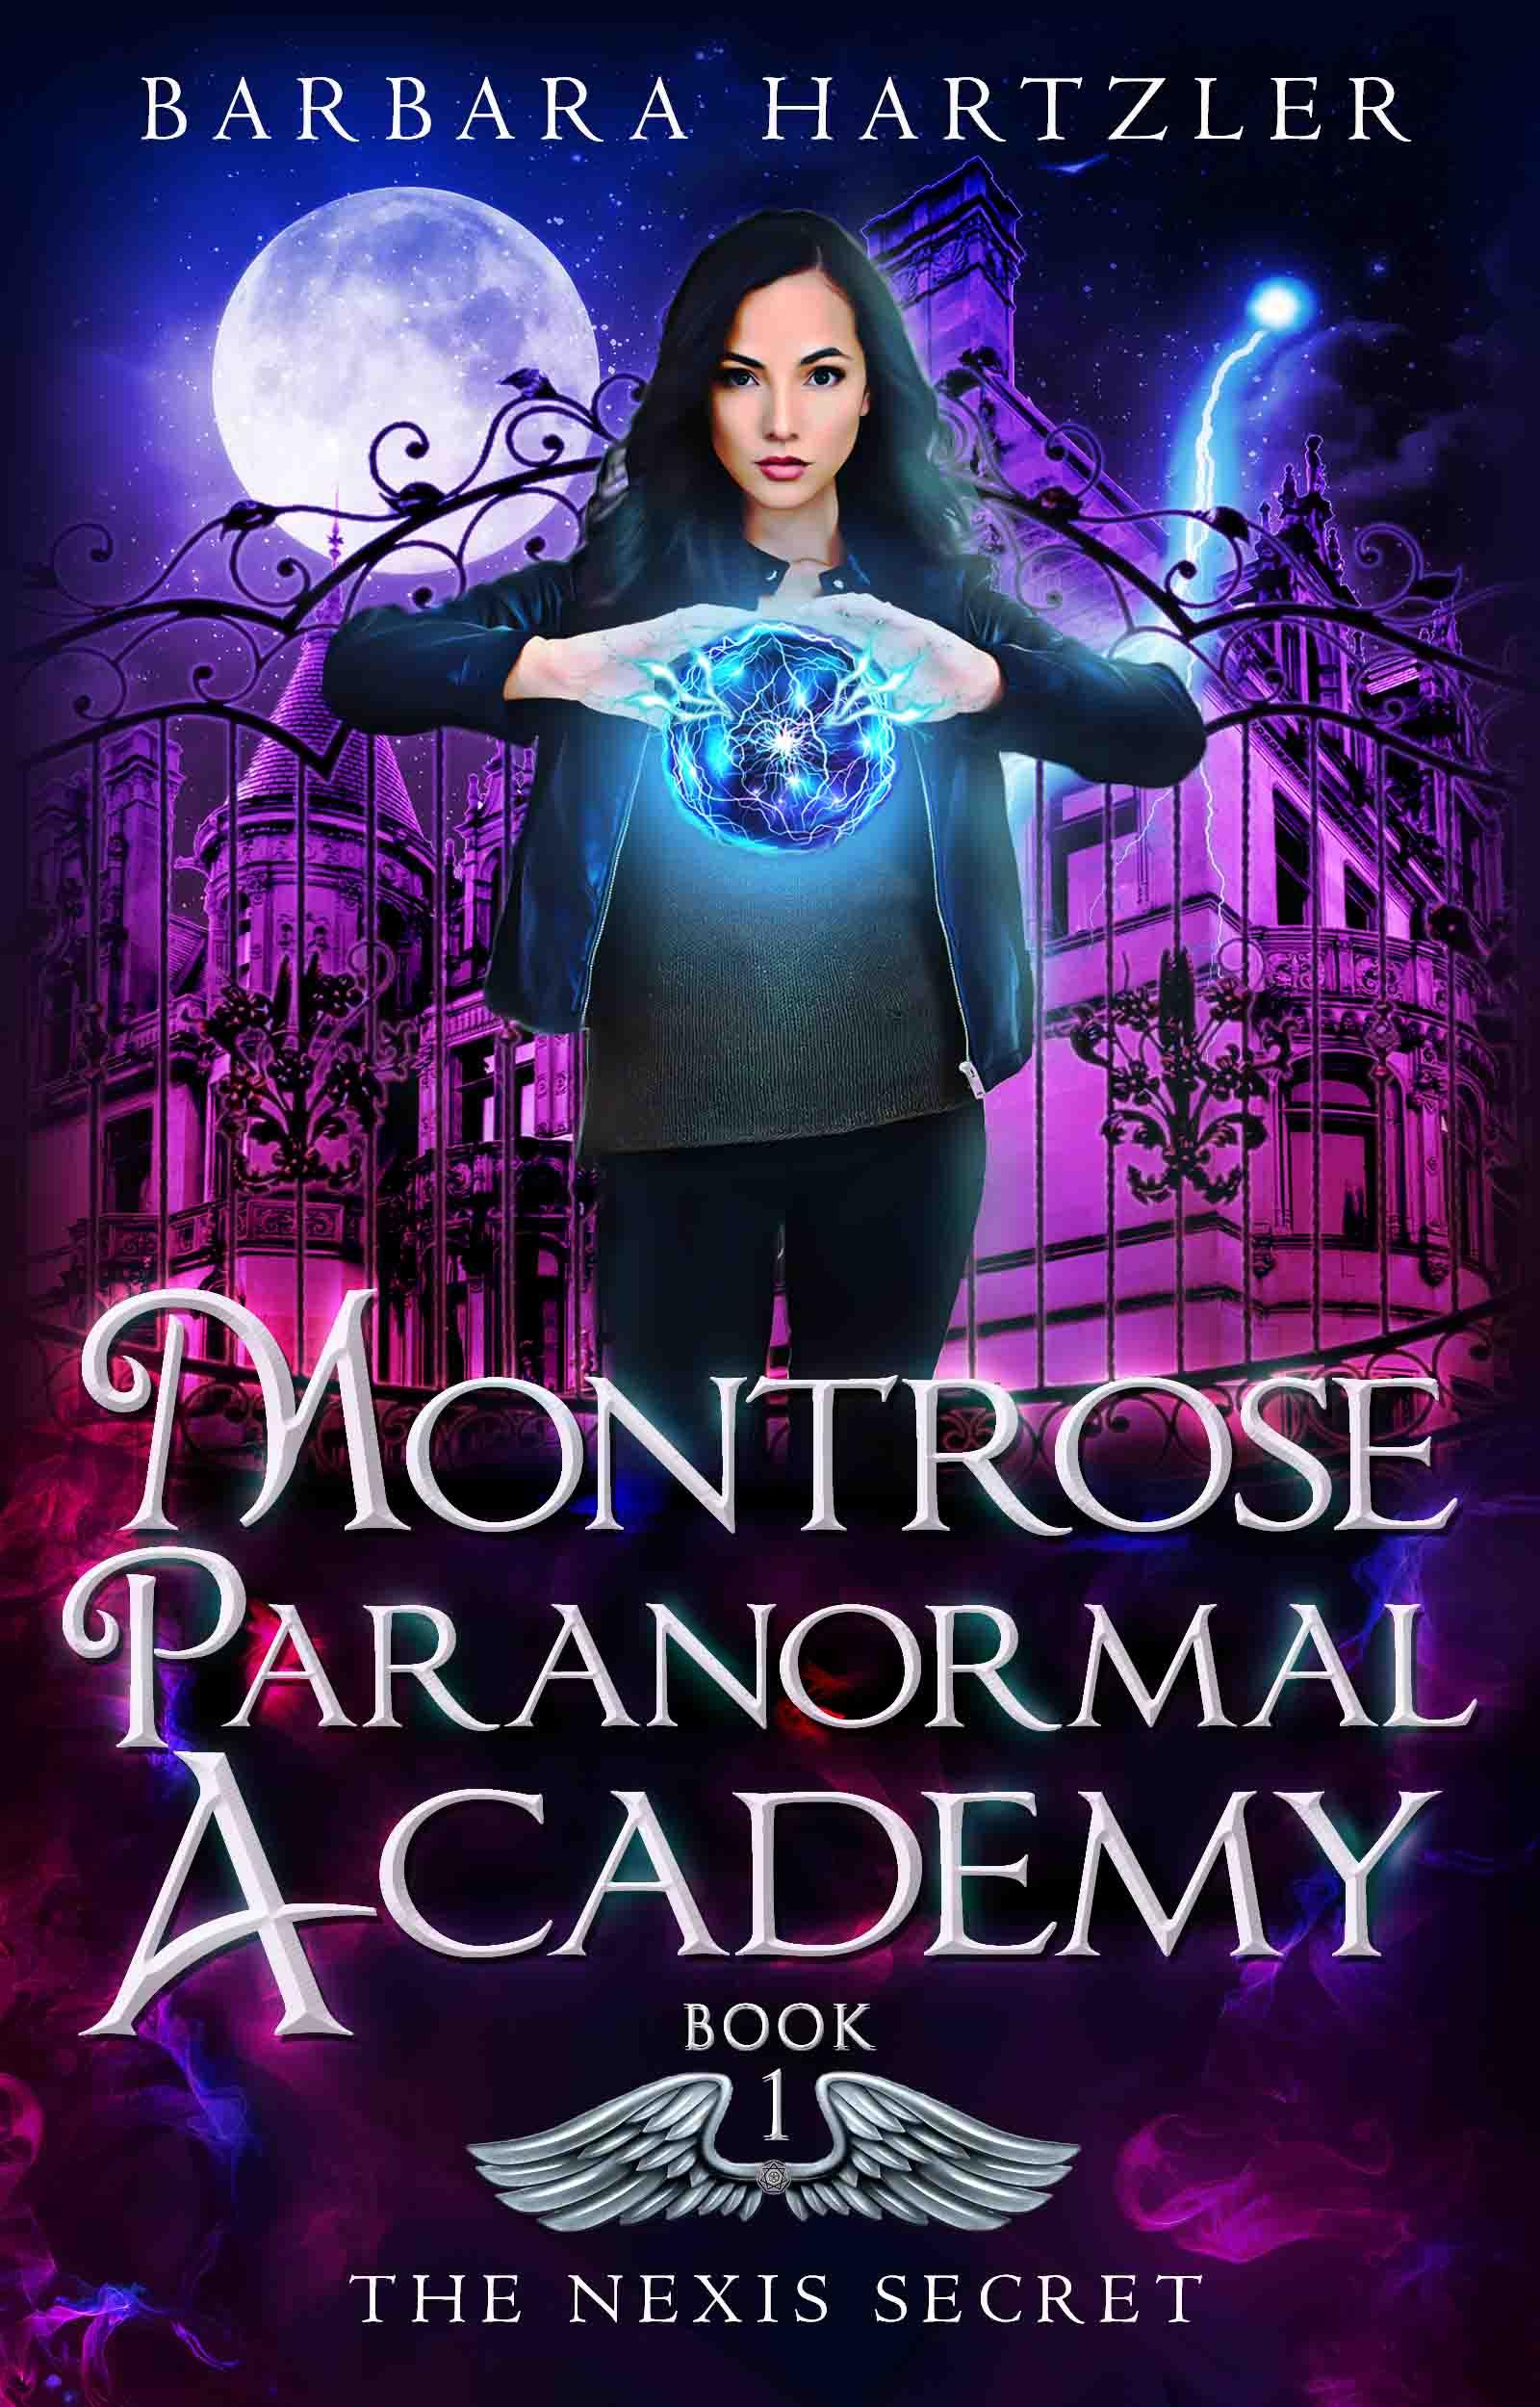 Montrose Paranormal Academy (Book 1), The Nexis Secret